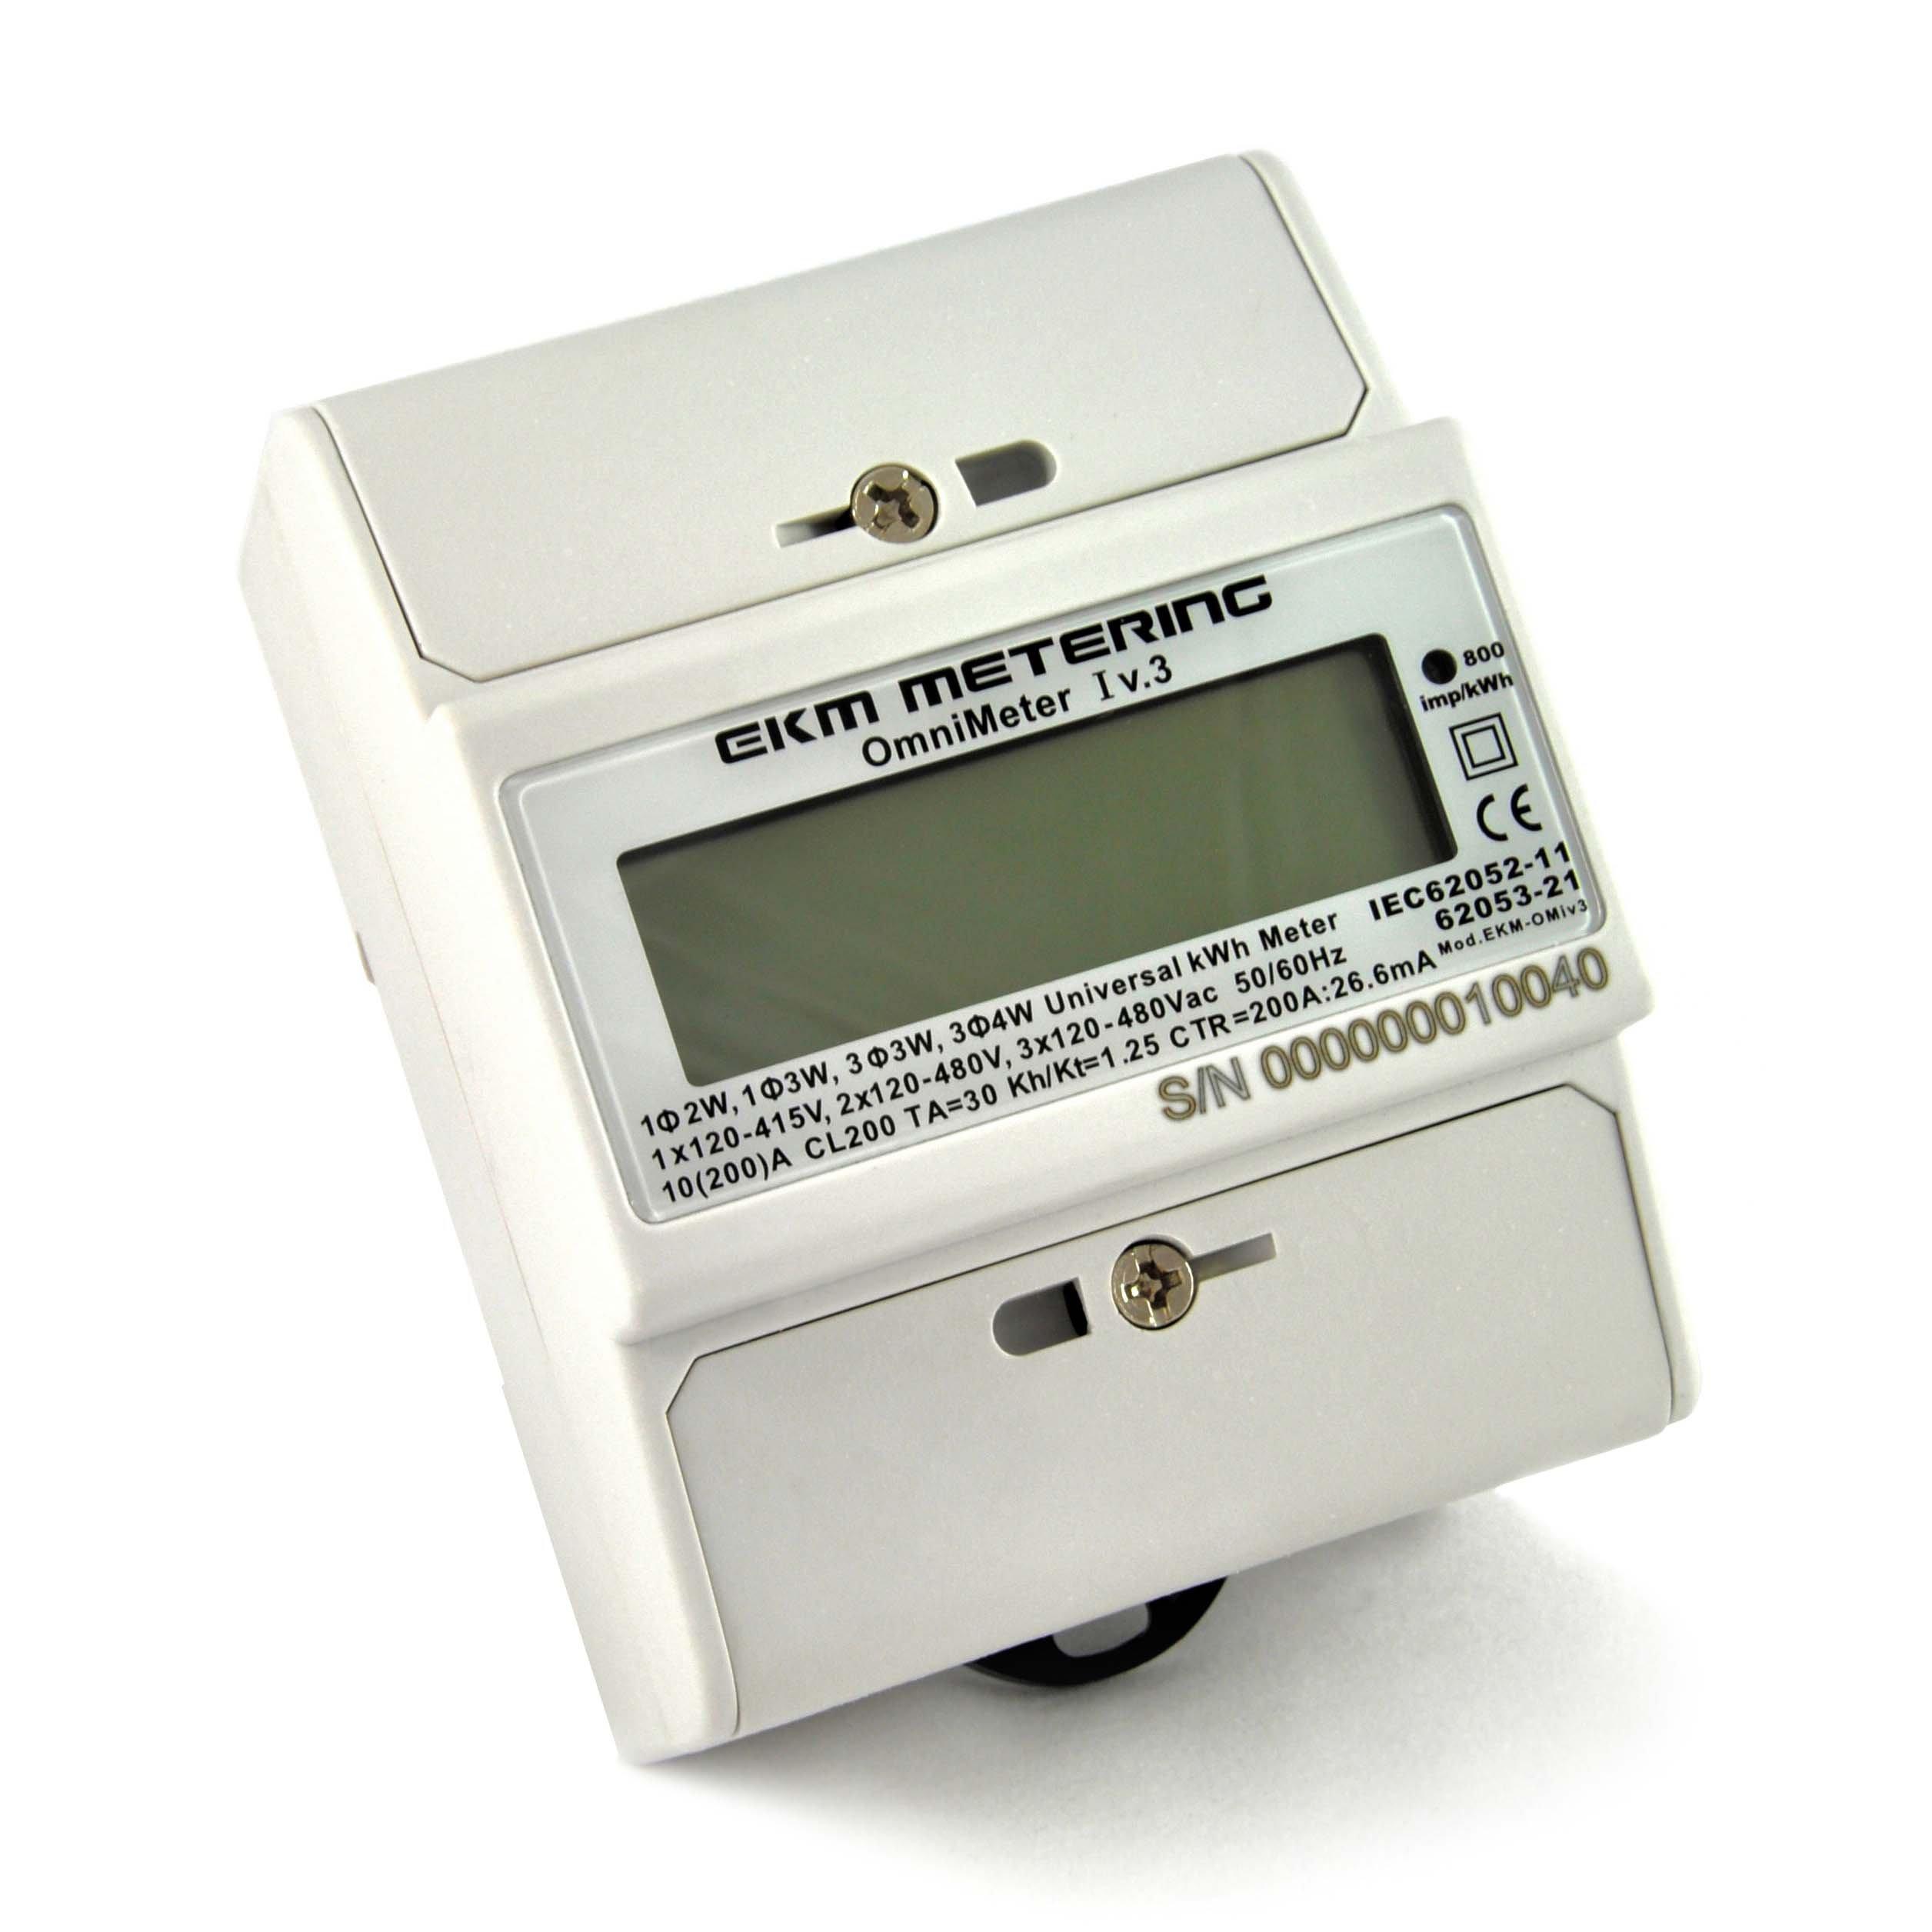 EKM Metering Omnimeter - Universal Smart Submeter